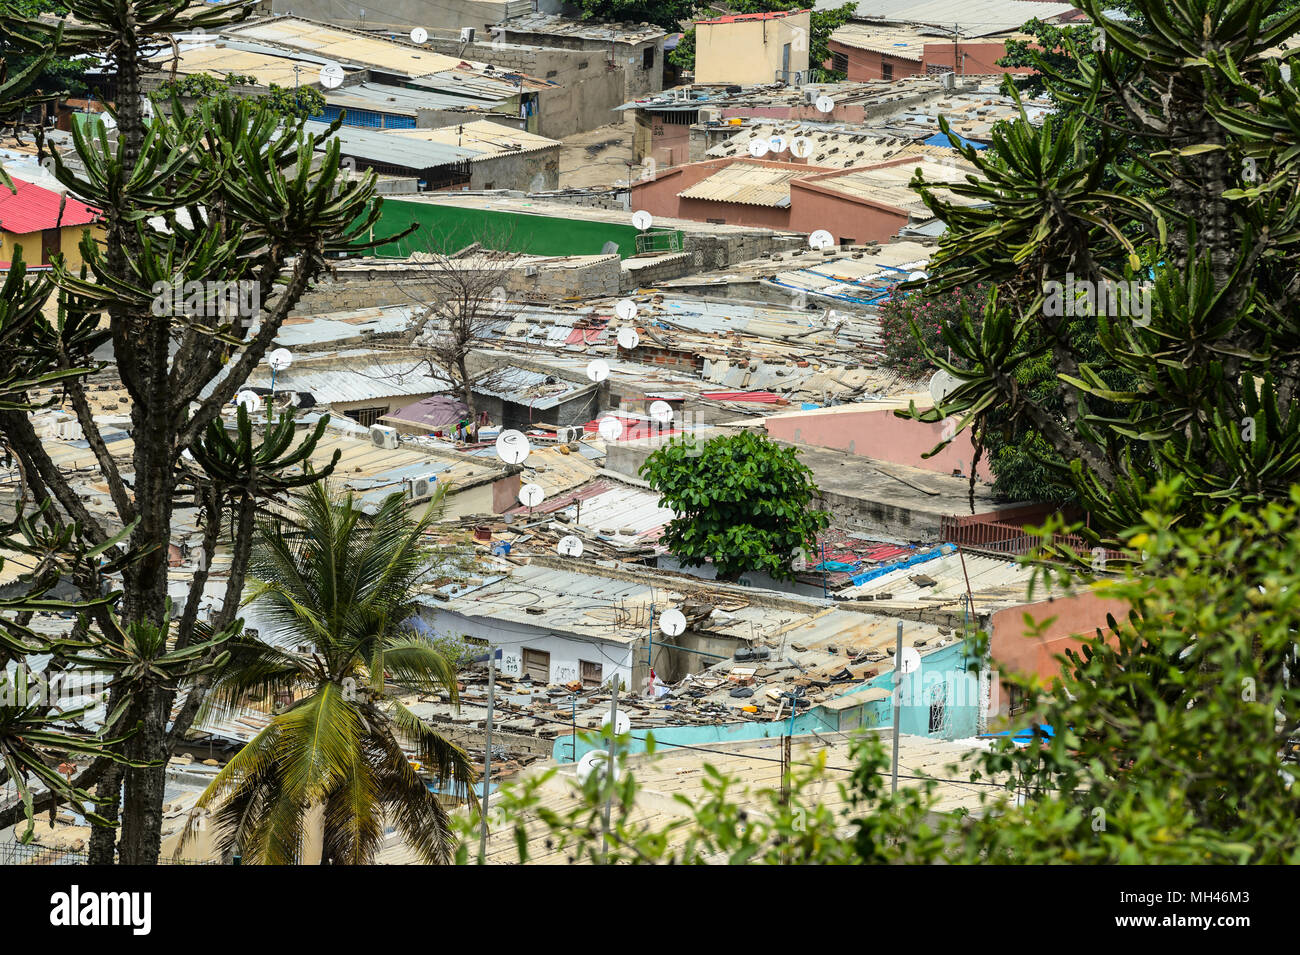 Living place in Angola, Luanda Stock Photo